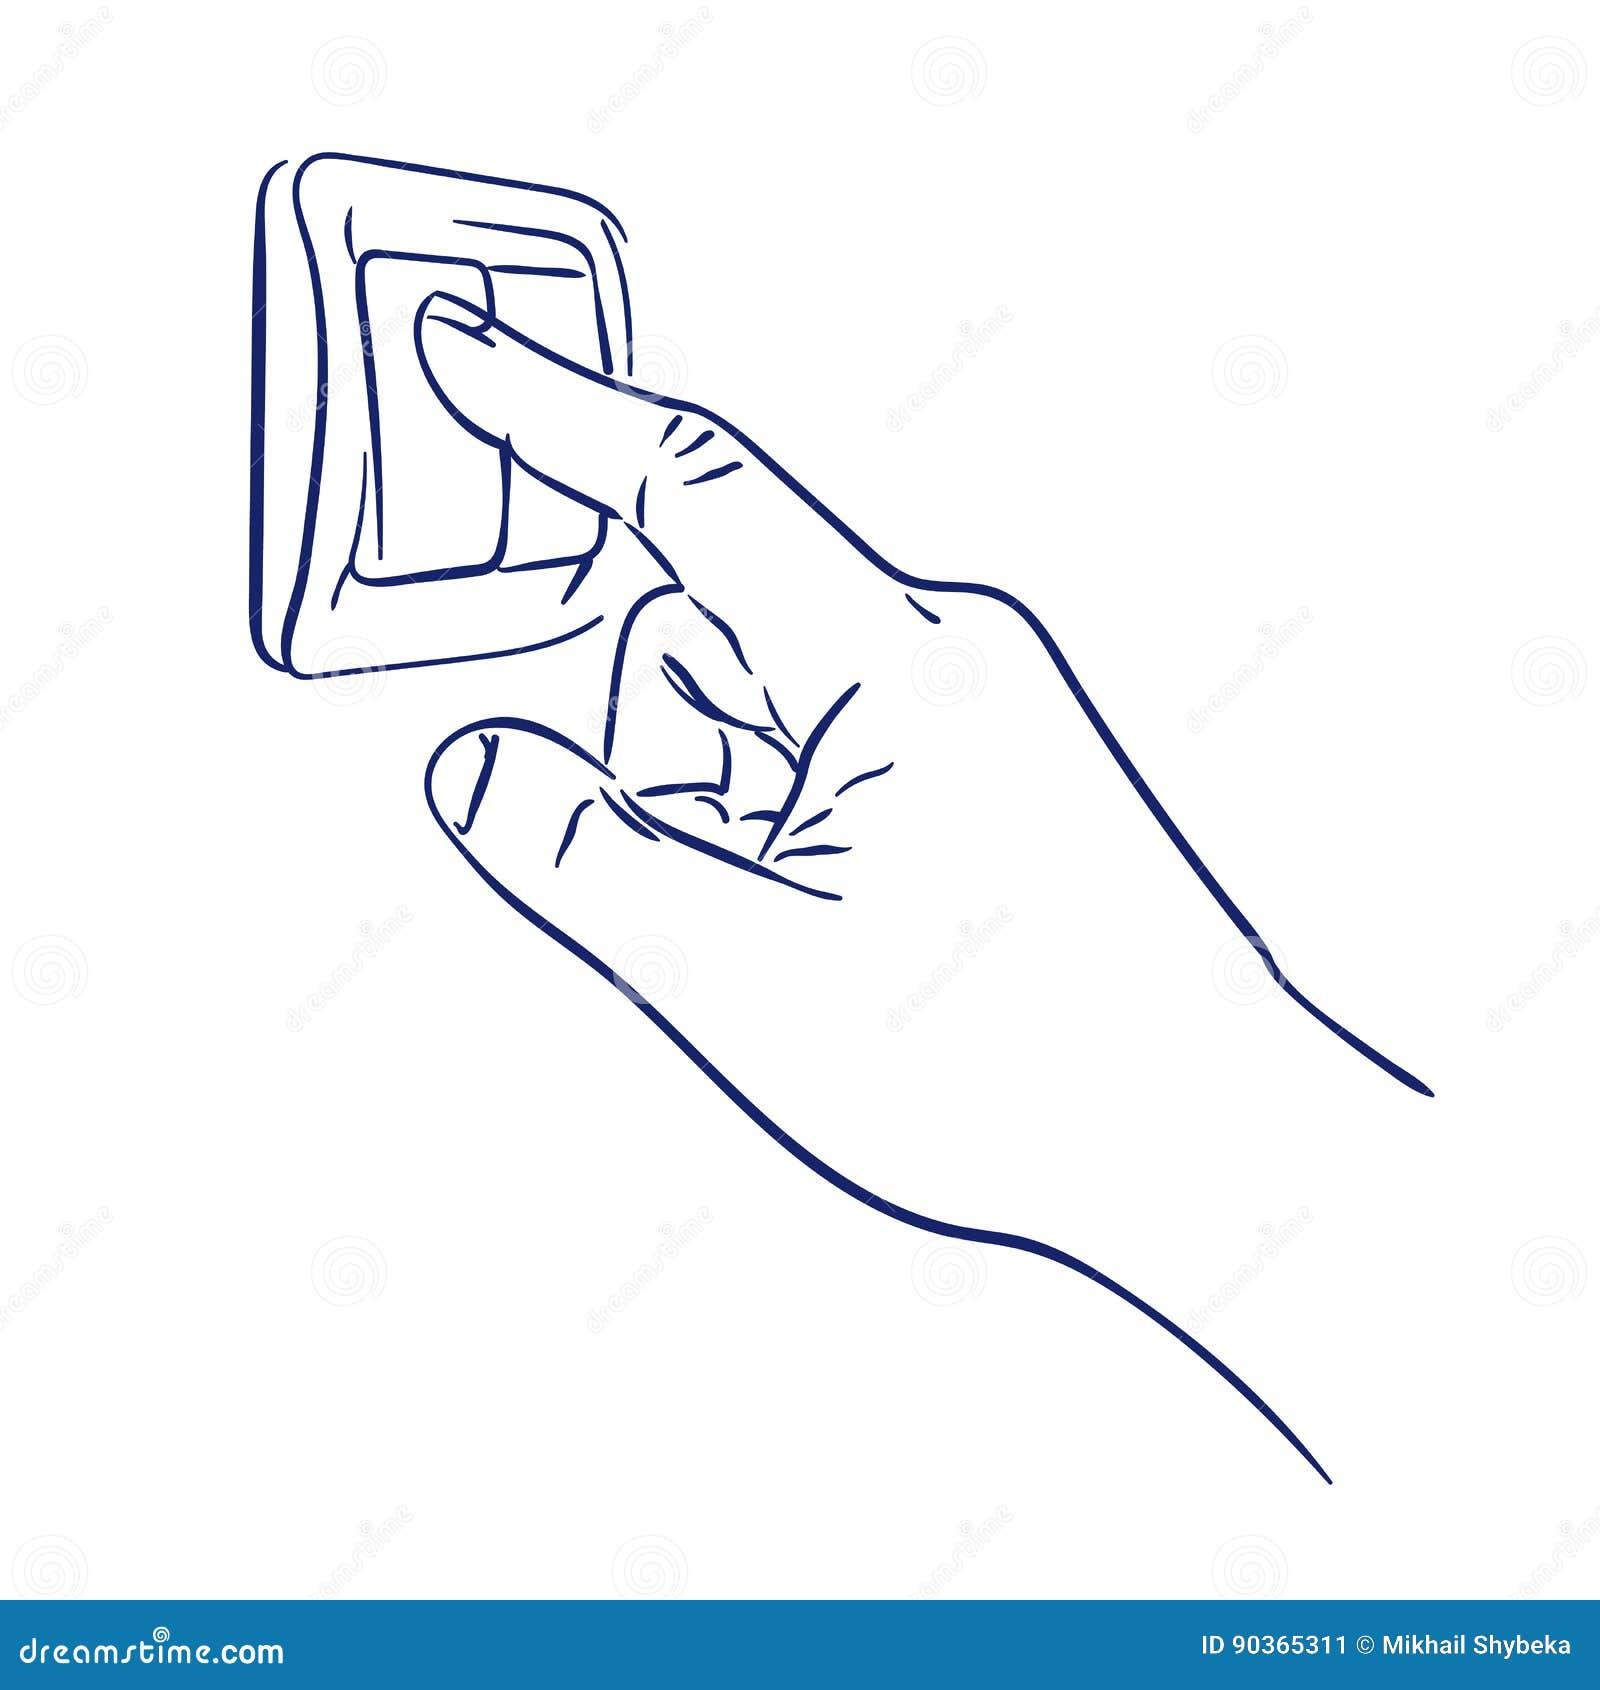 Turn The Light Switch On Hand Stock Vector - Illustration of finger ...